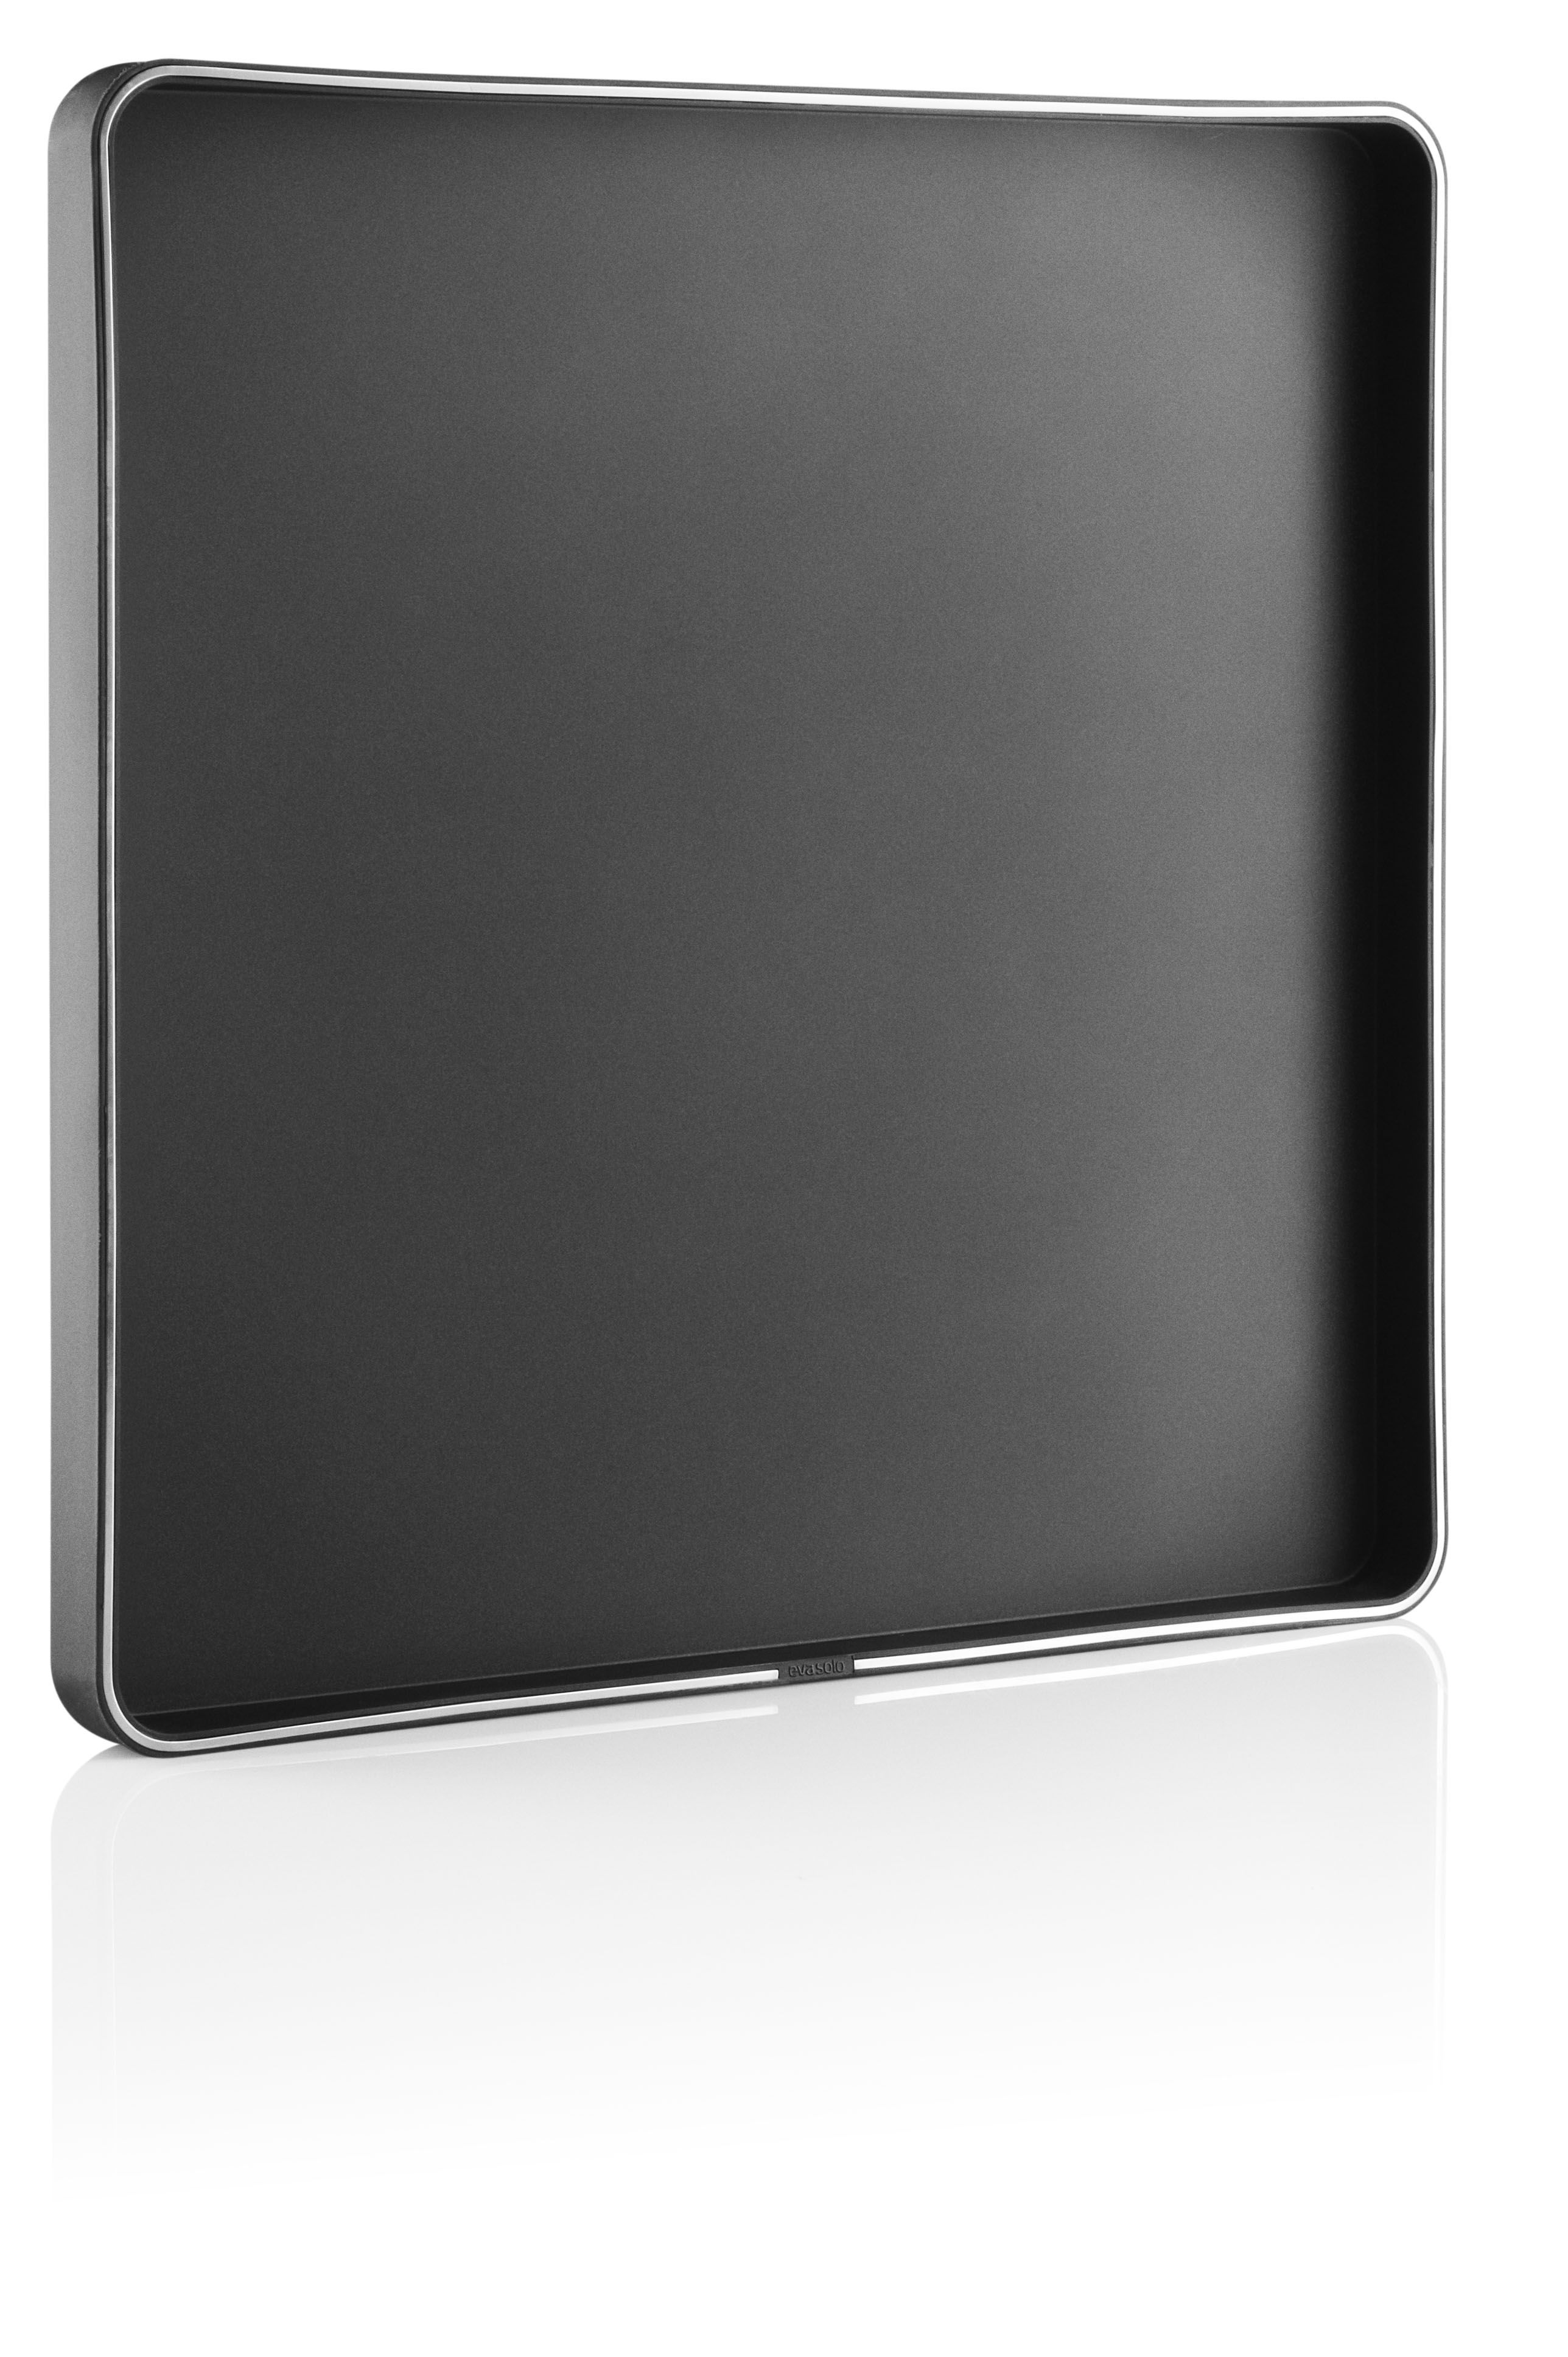 rutschfest 34 x 34 cm eva solo tablett. Black Bedroom Furniture Sets. Home Design Ideas